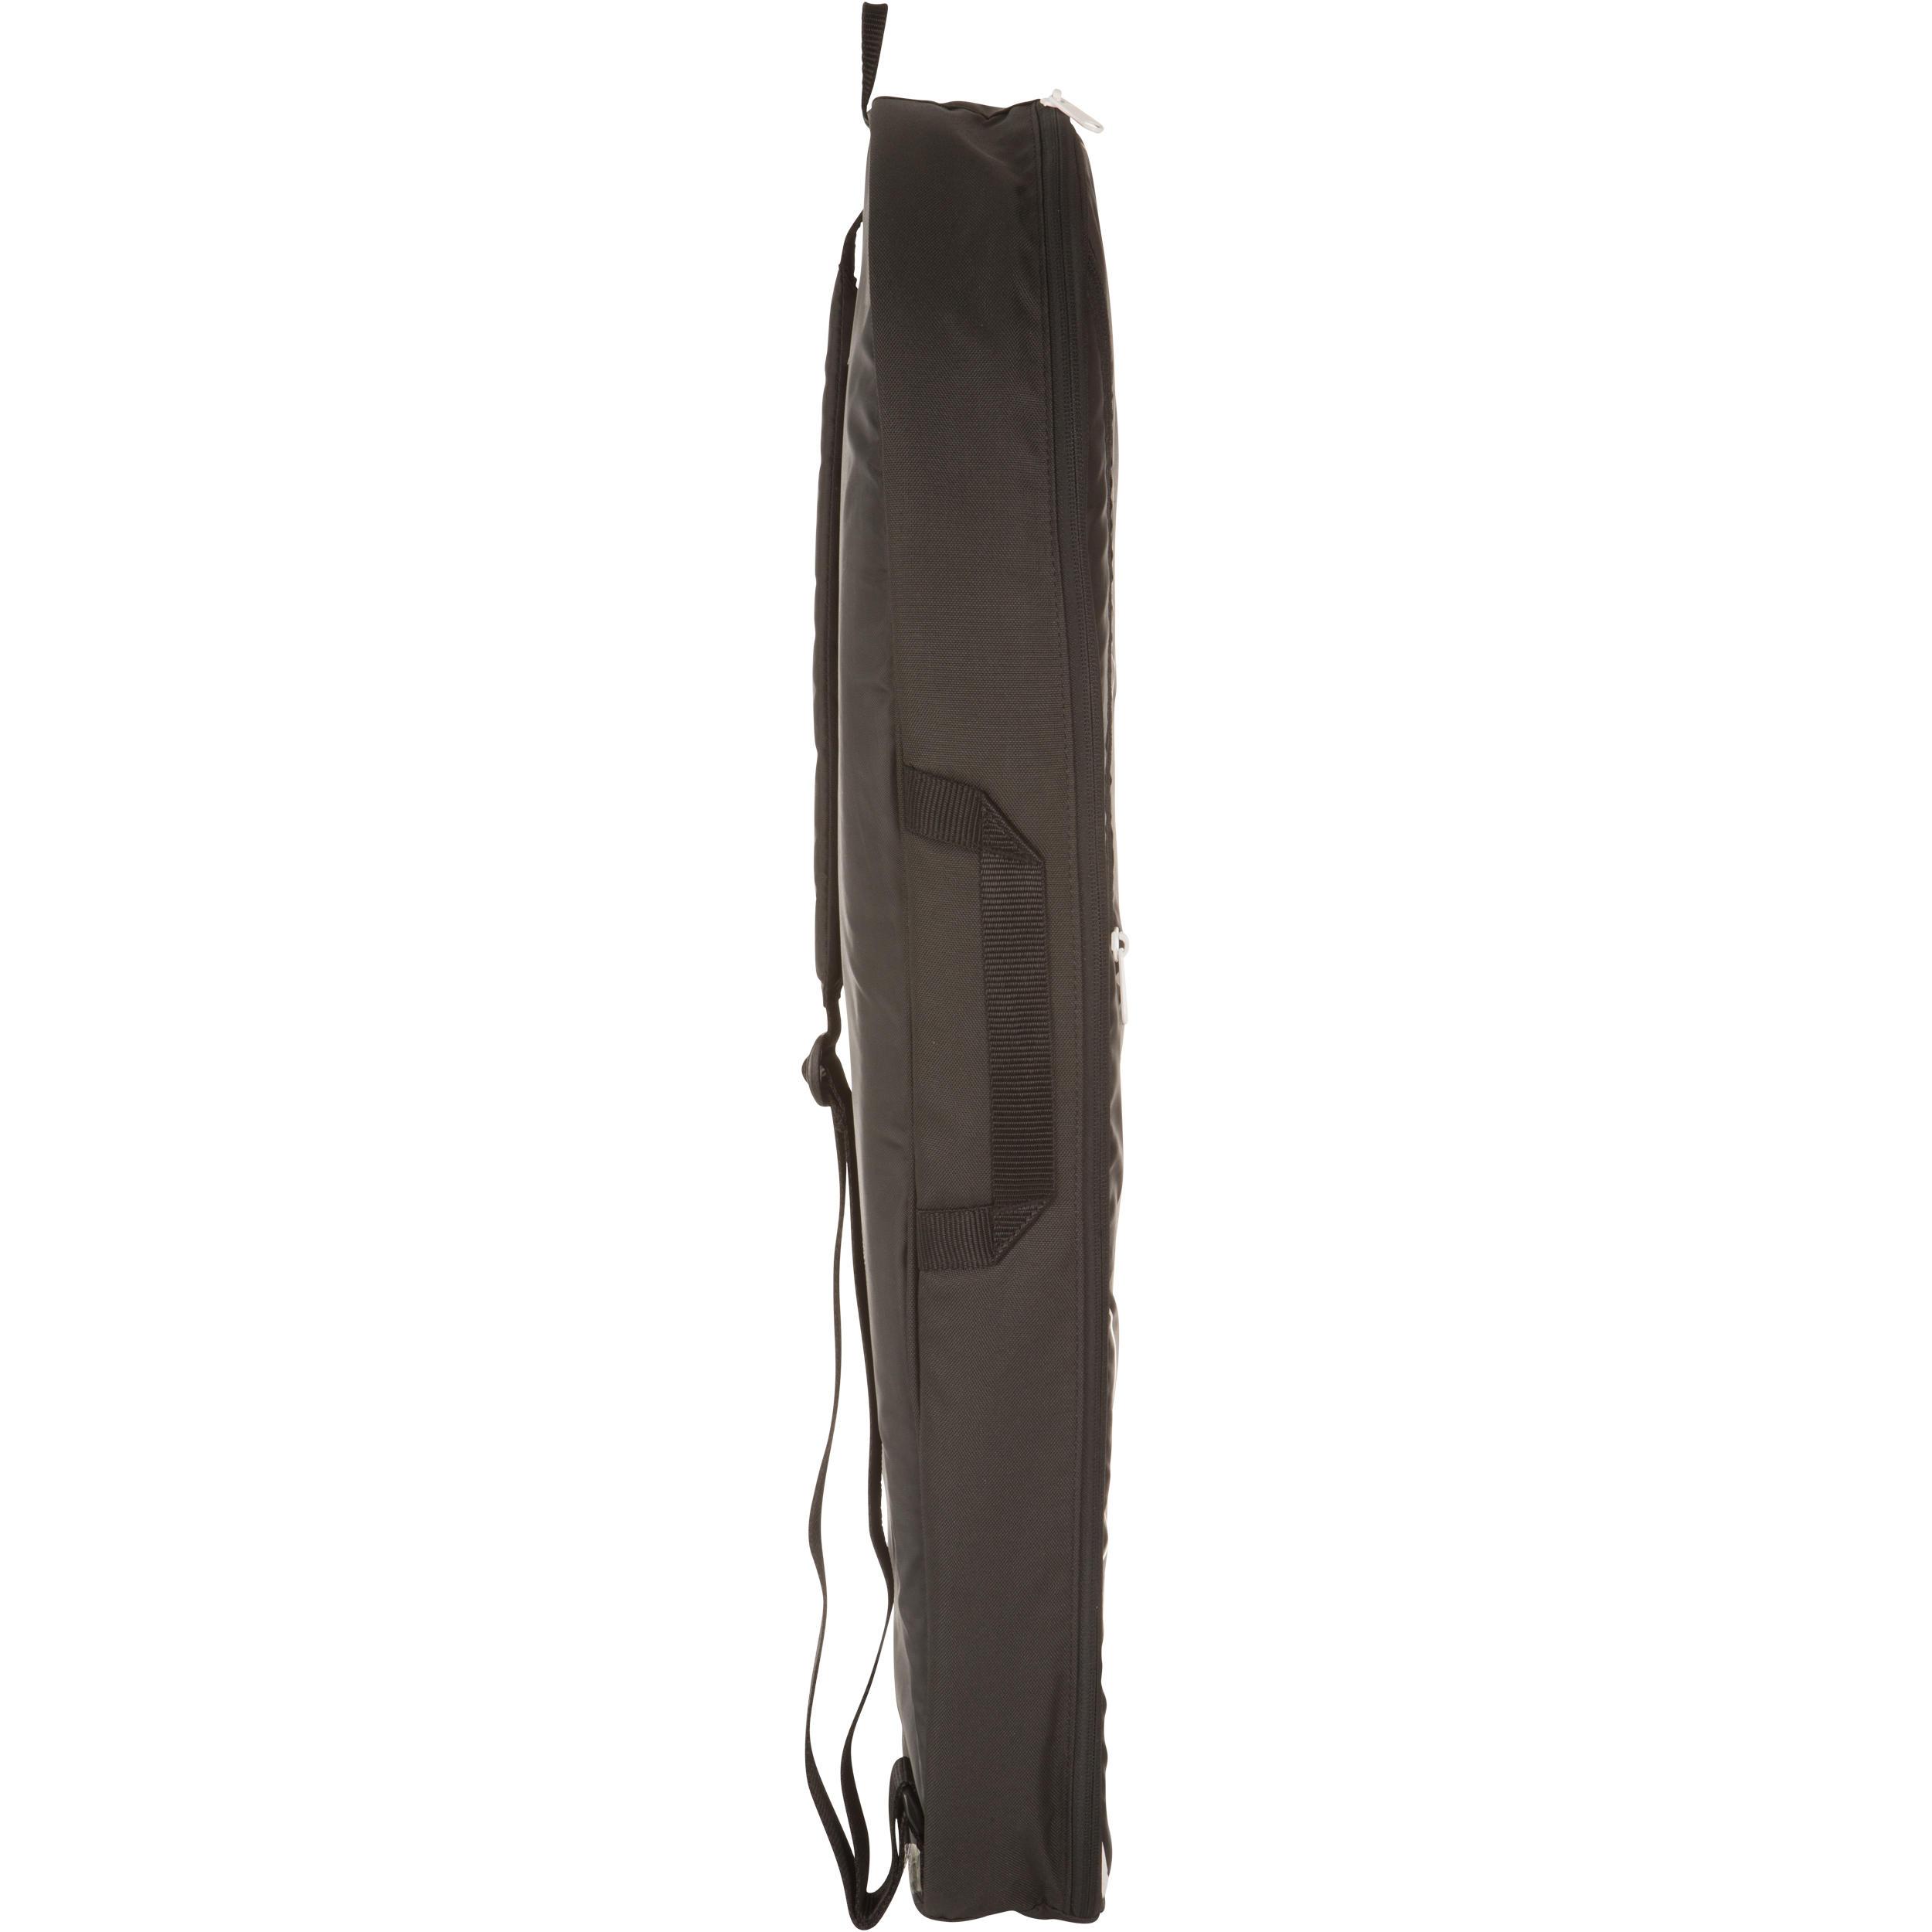 Bag Racket Sports MB500 - Black